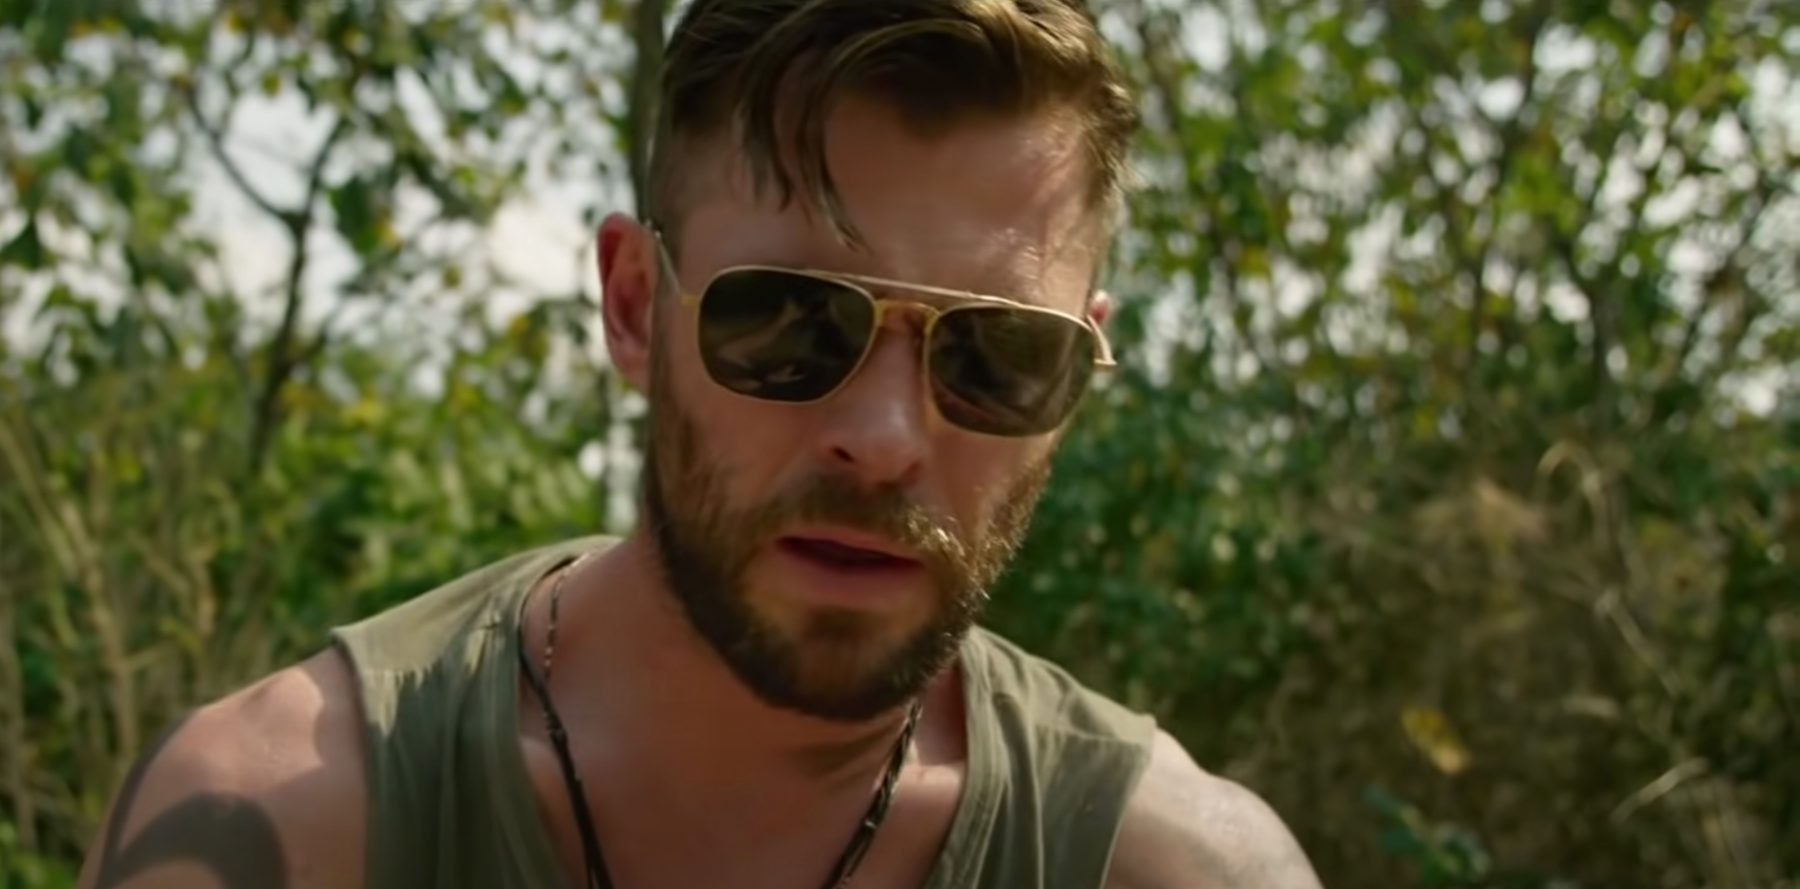 Sunglasses Chris Hemsworth In Extraction